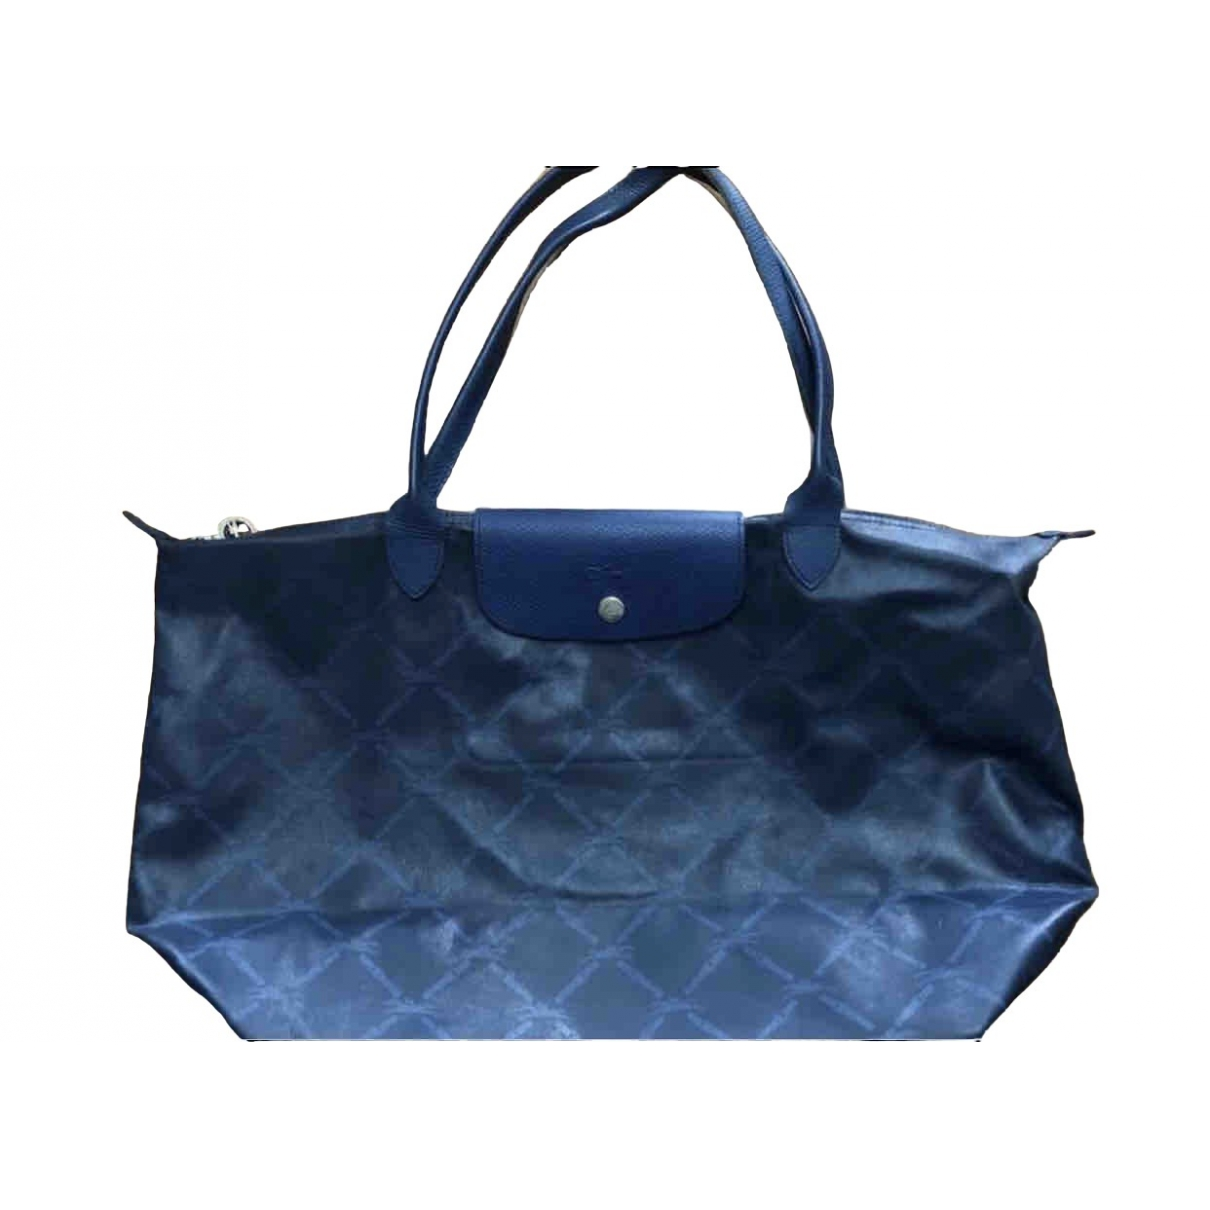 Cabas Pliage  de Lino Longchamp